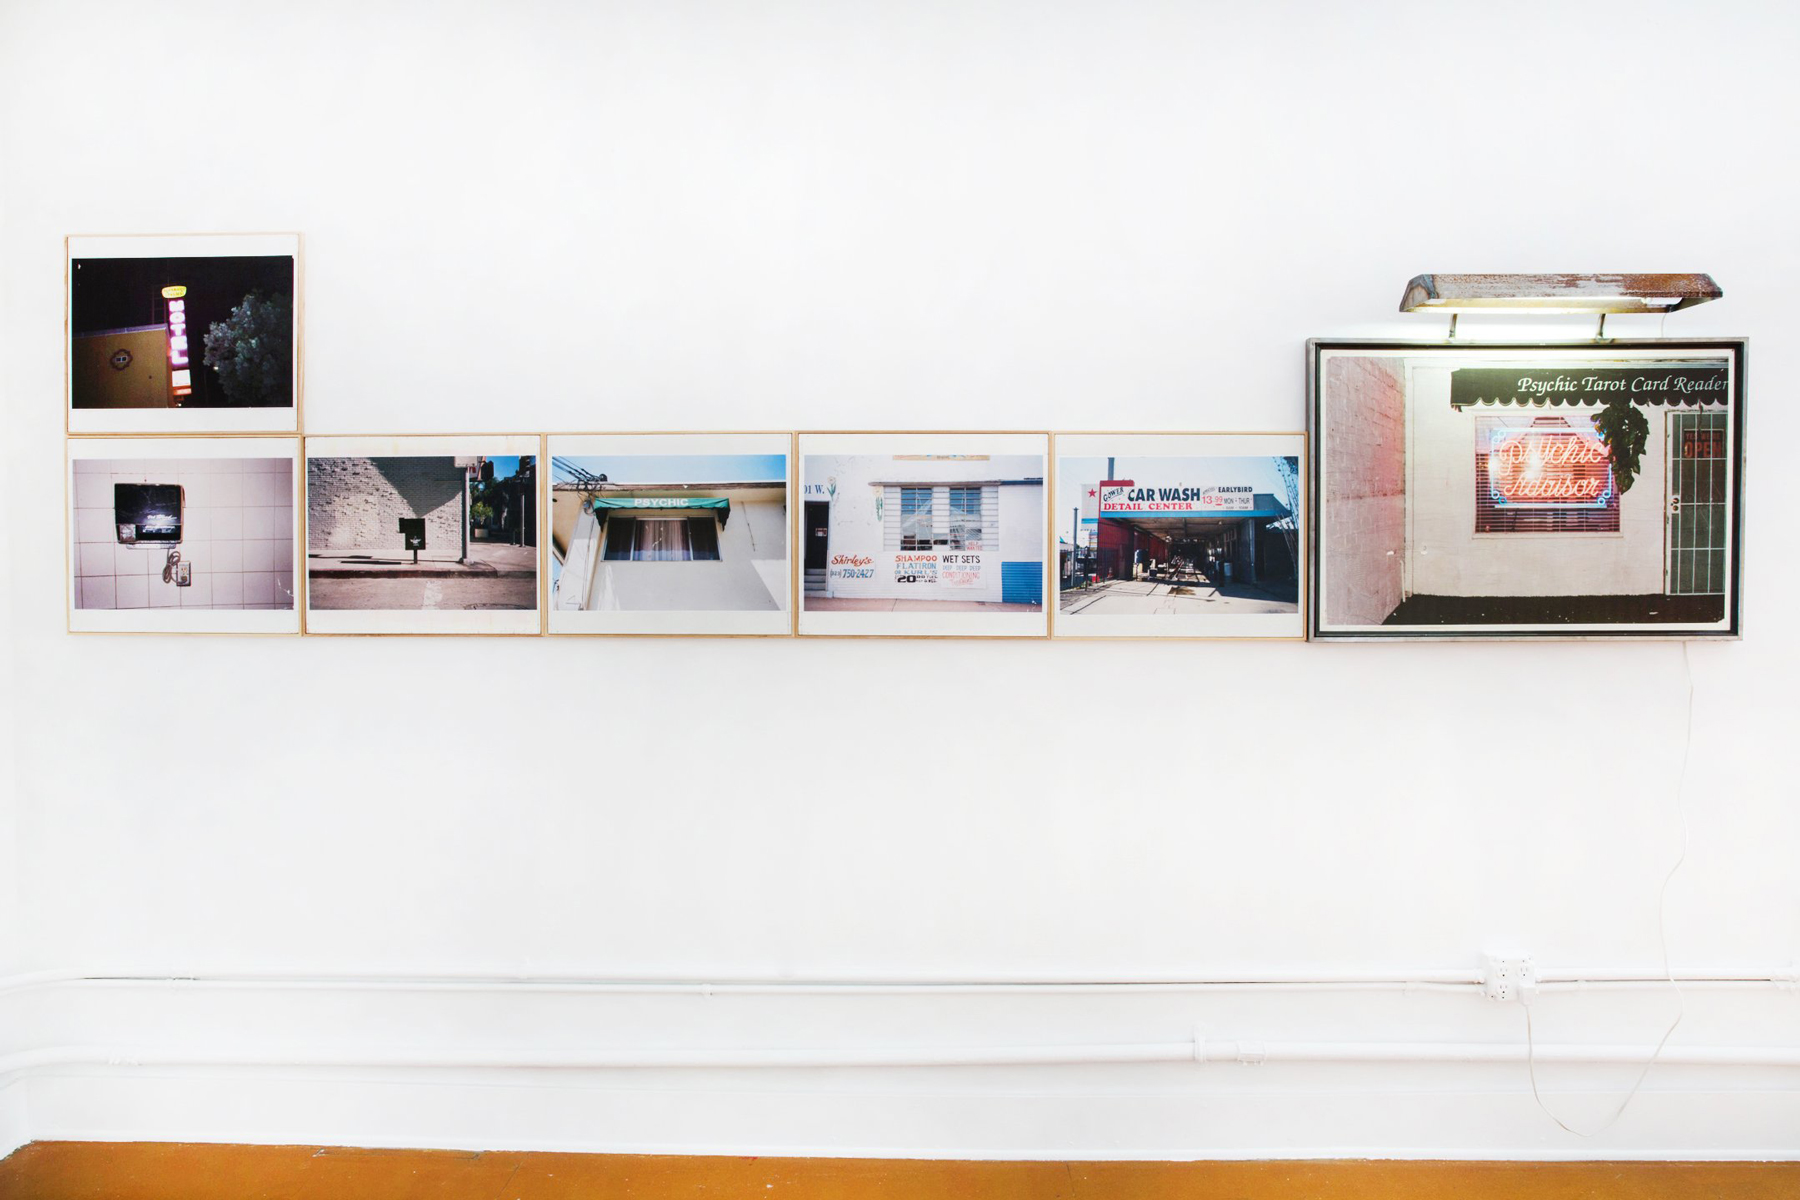 Dan Monick: Goodbye to Romance, photography exhibit @ These Days // photo source: thesedaysla.com